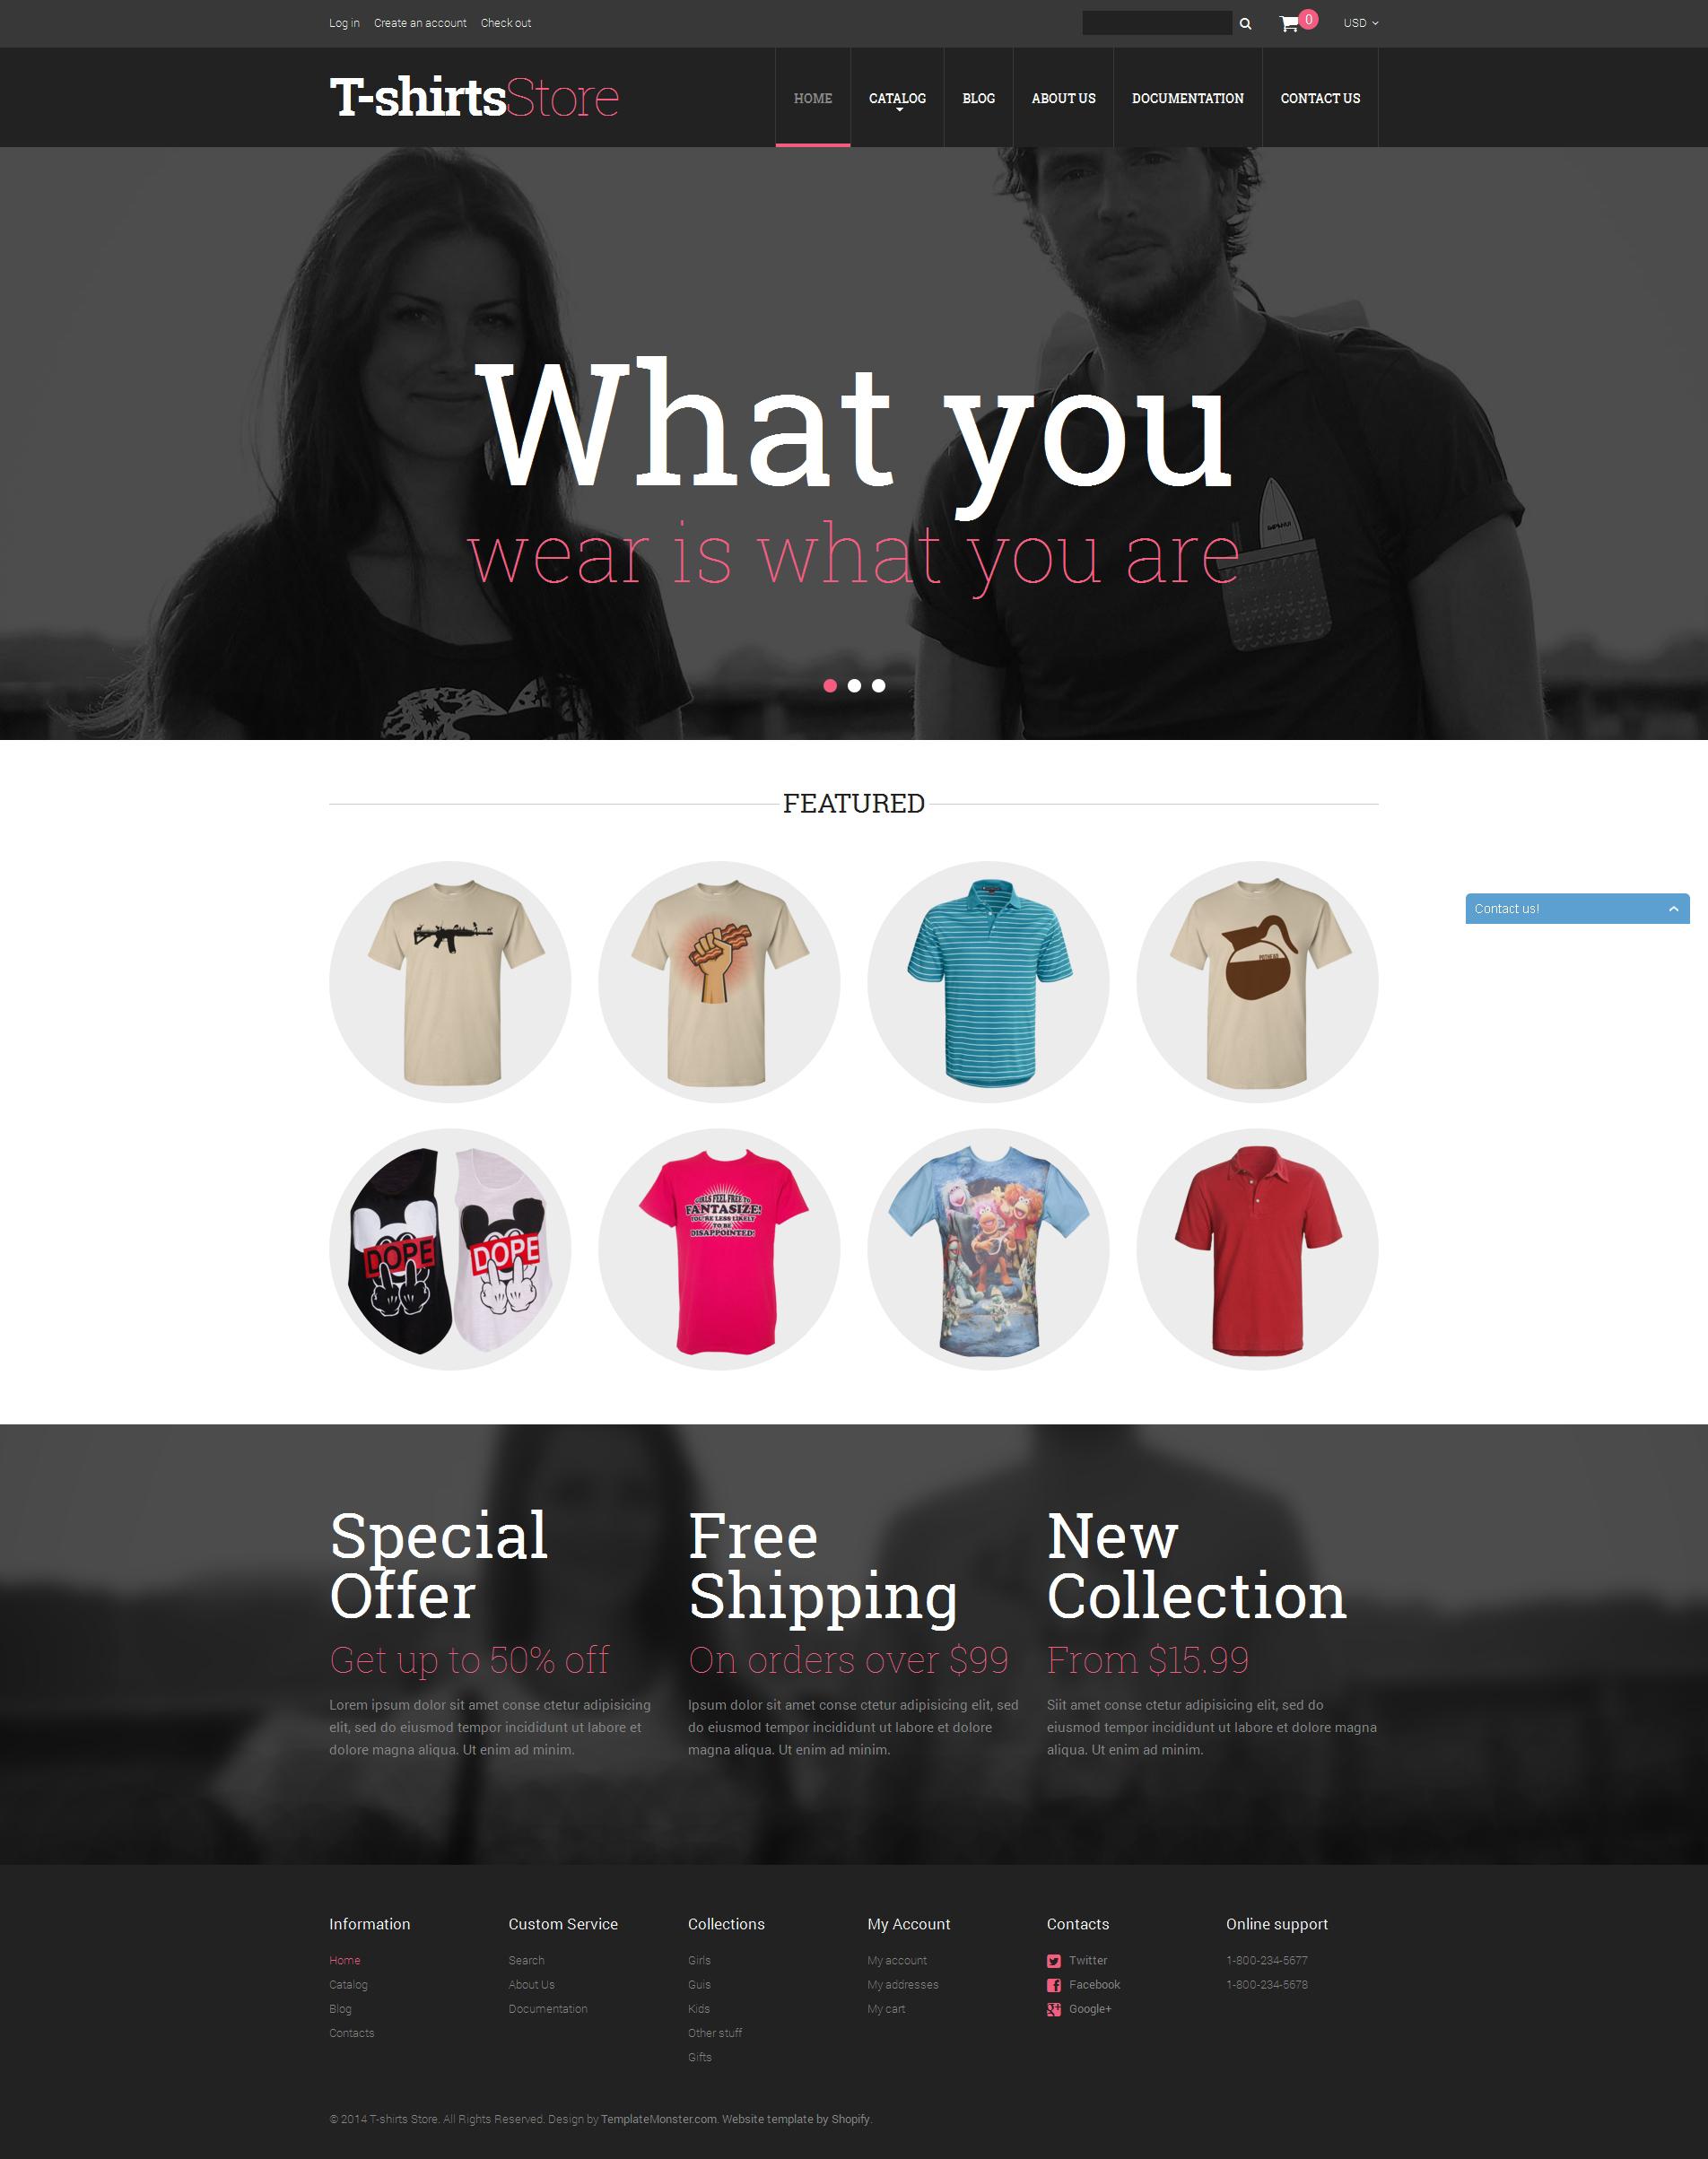 T shirt design editor free download - Stylish Tshirts